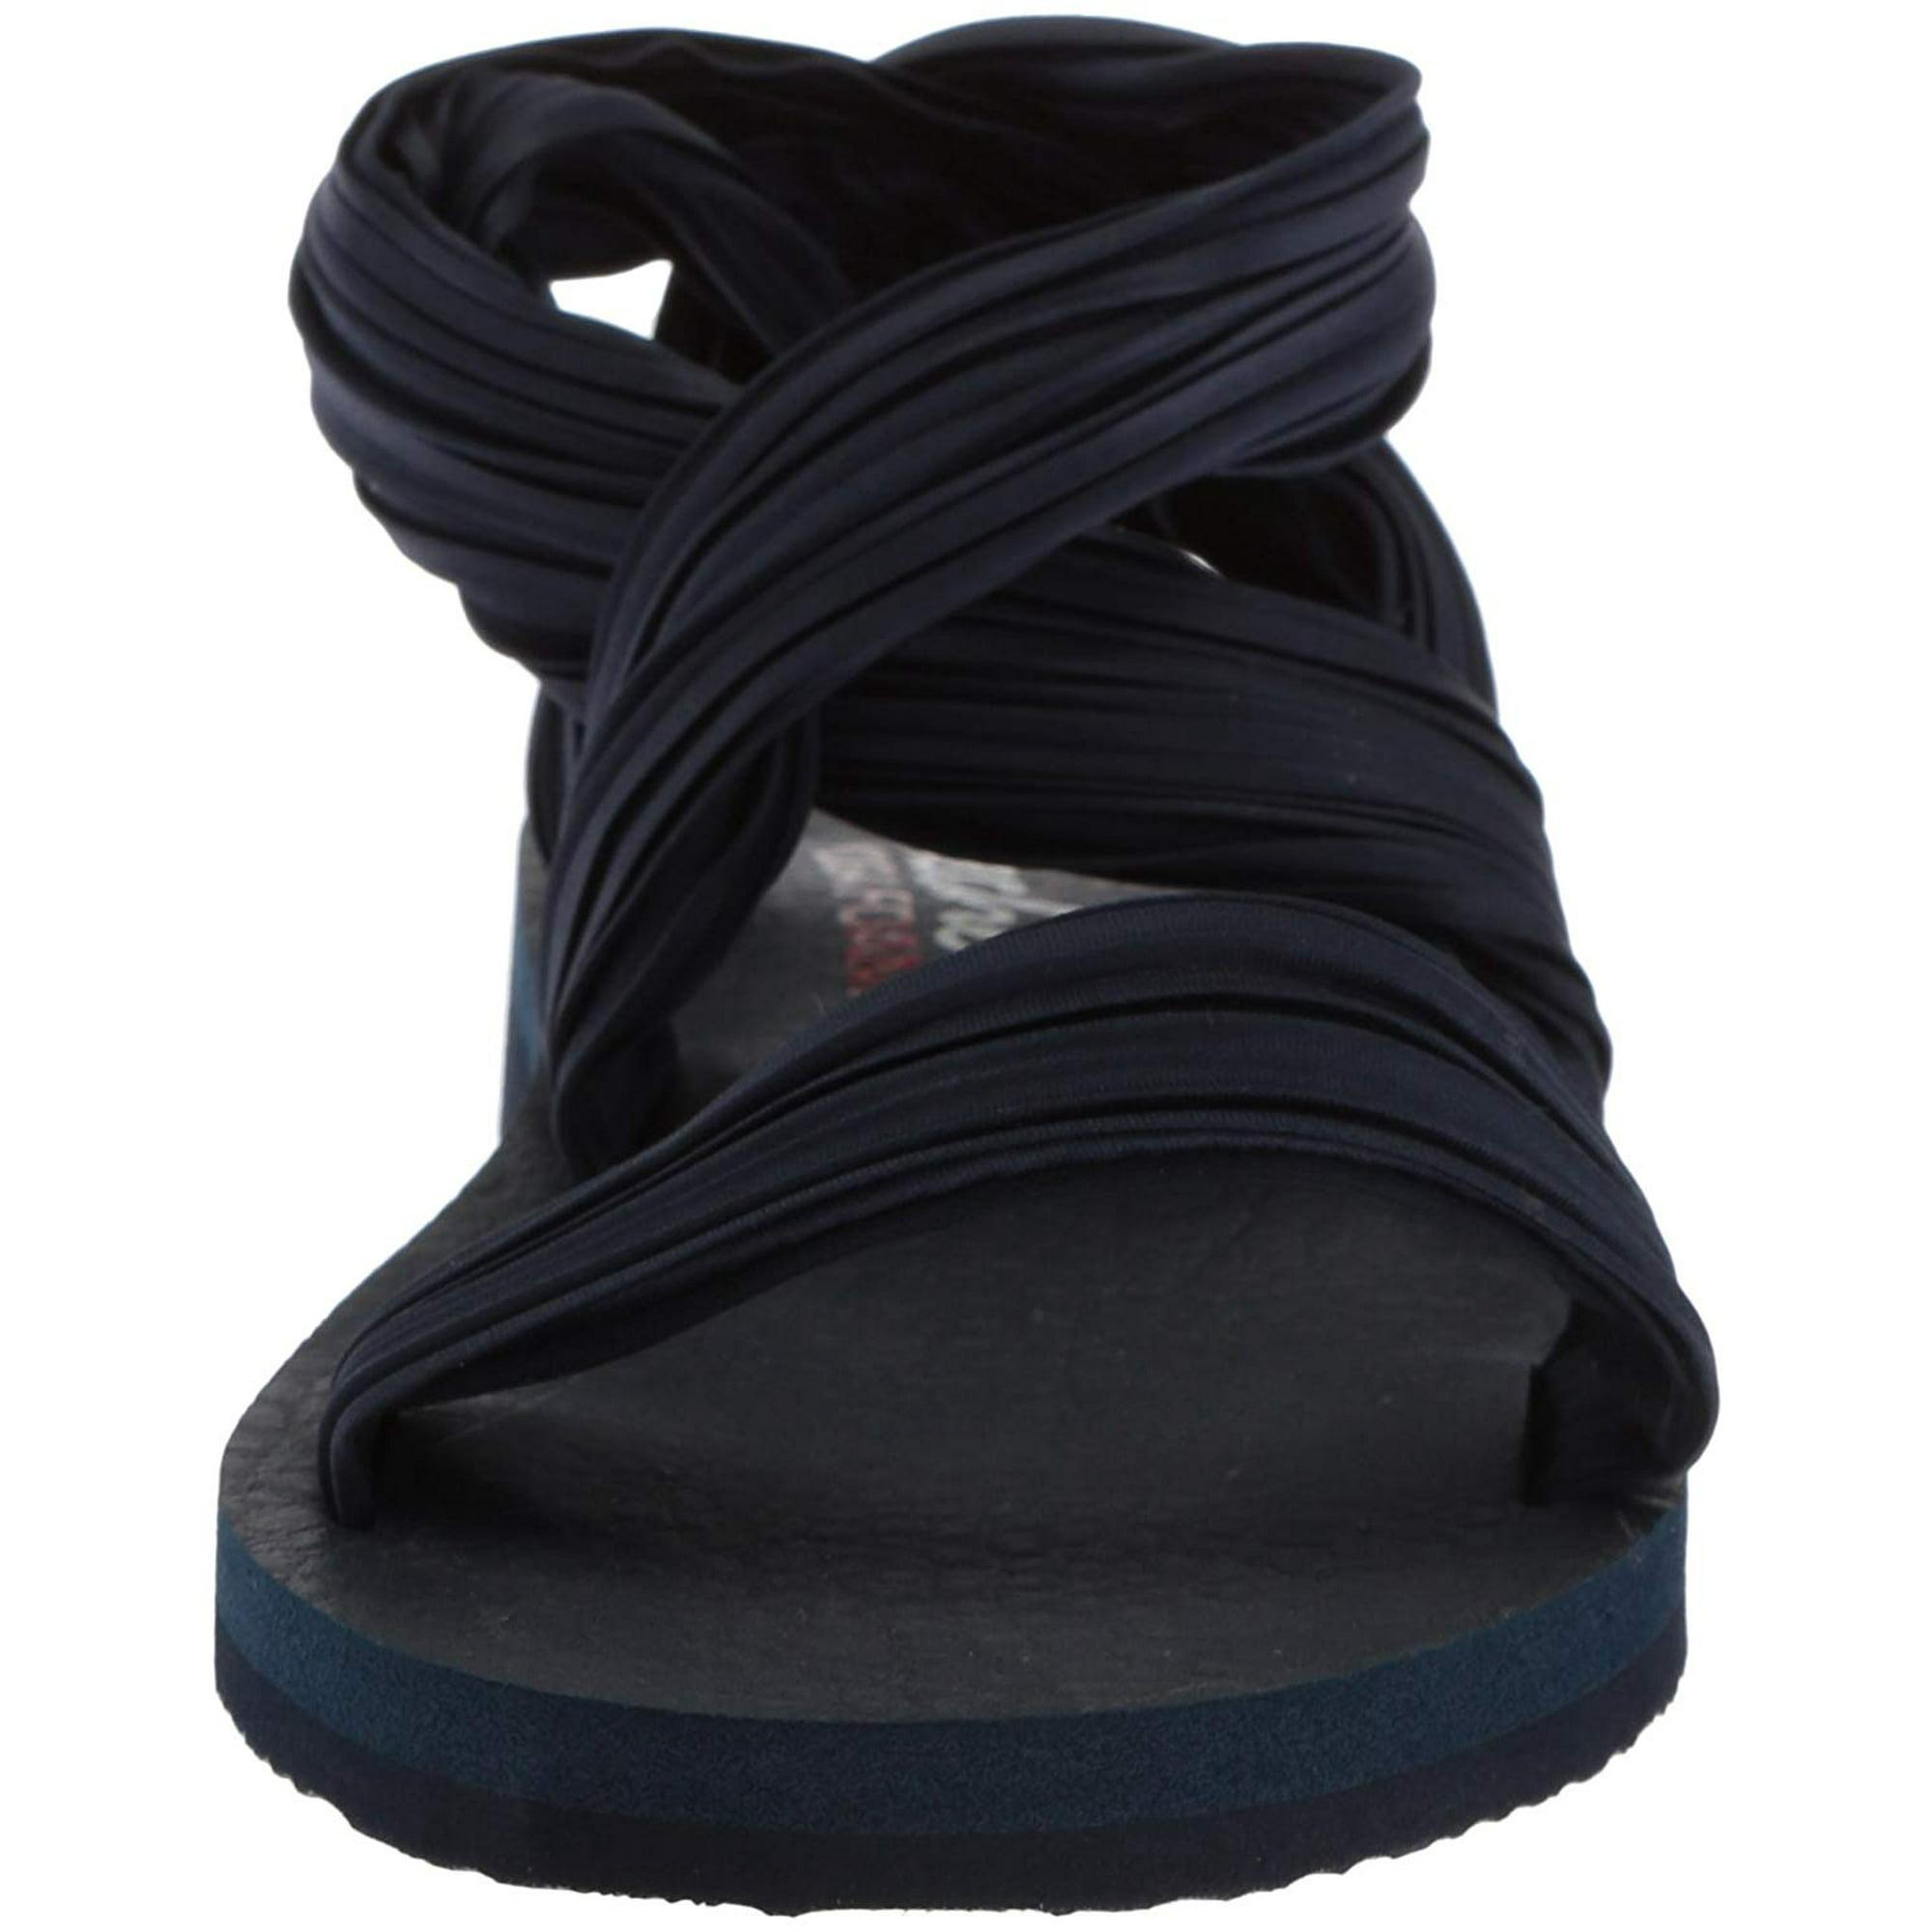 b3292919148c Skechers Womens Meditation Still Sky Open Toe Casual Strappy ...